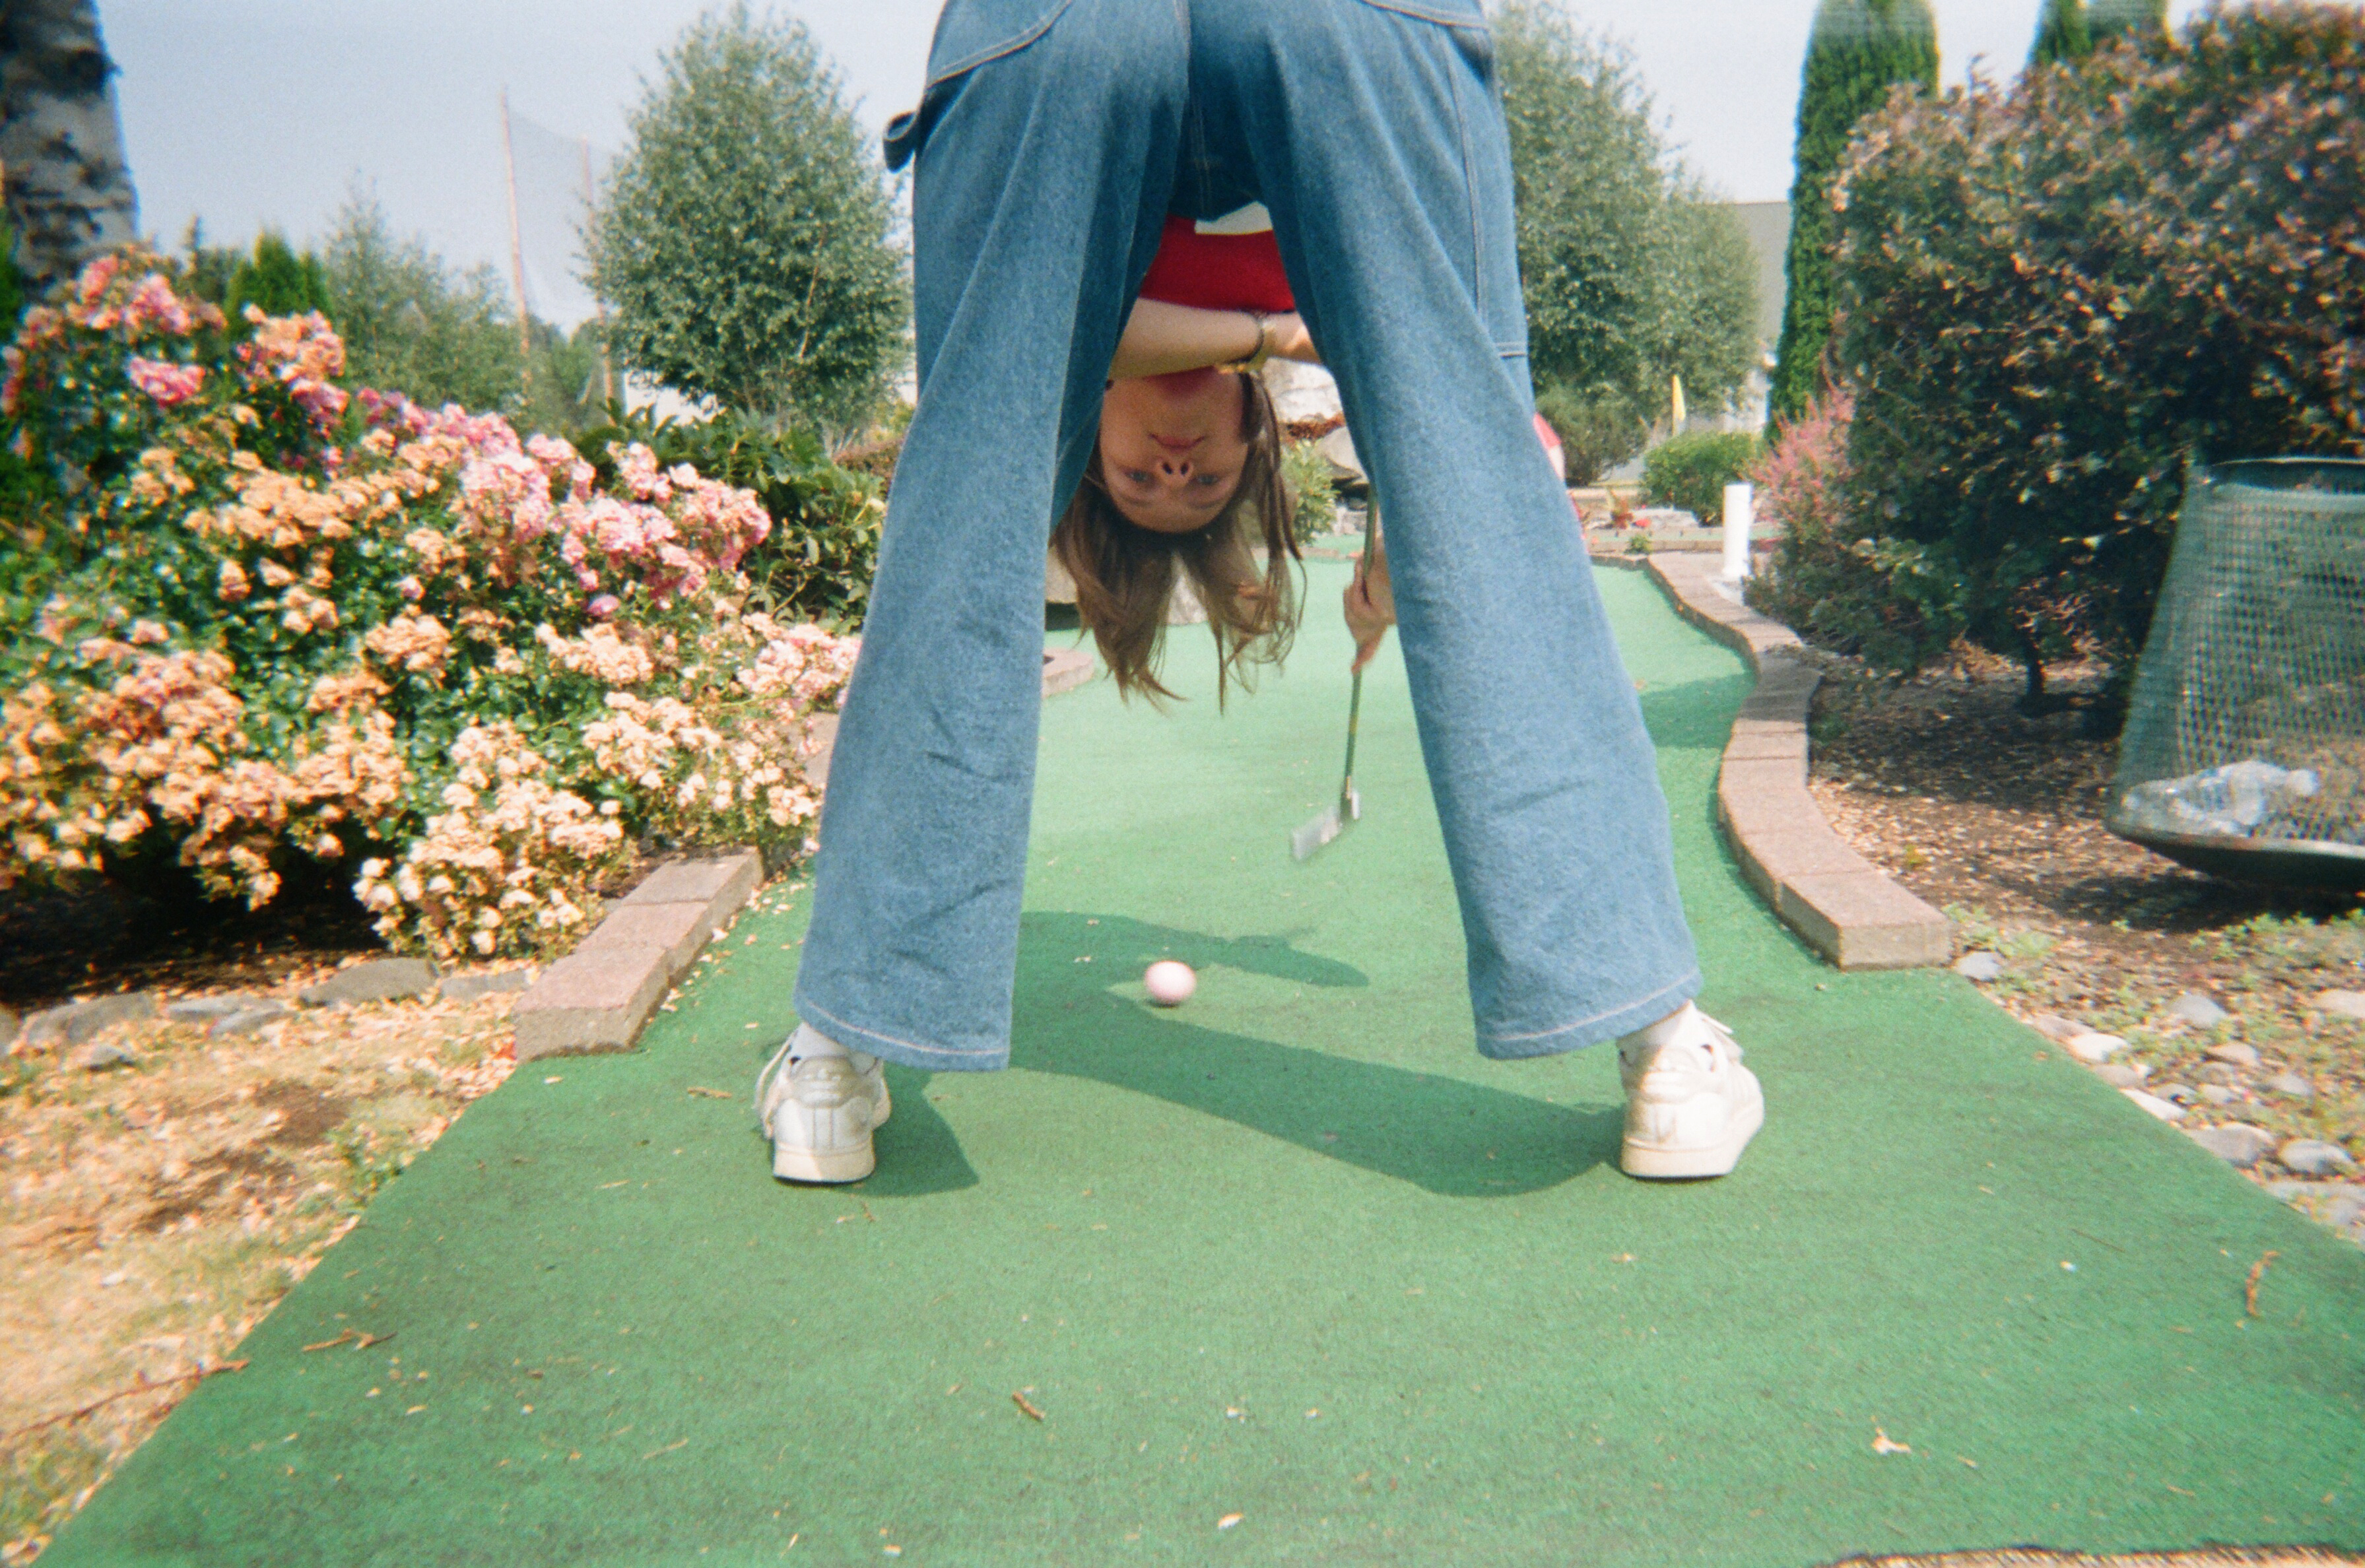 Sasha golfing upside down